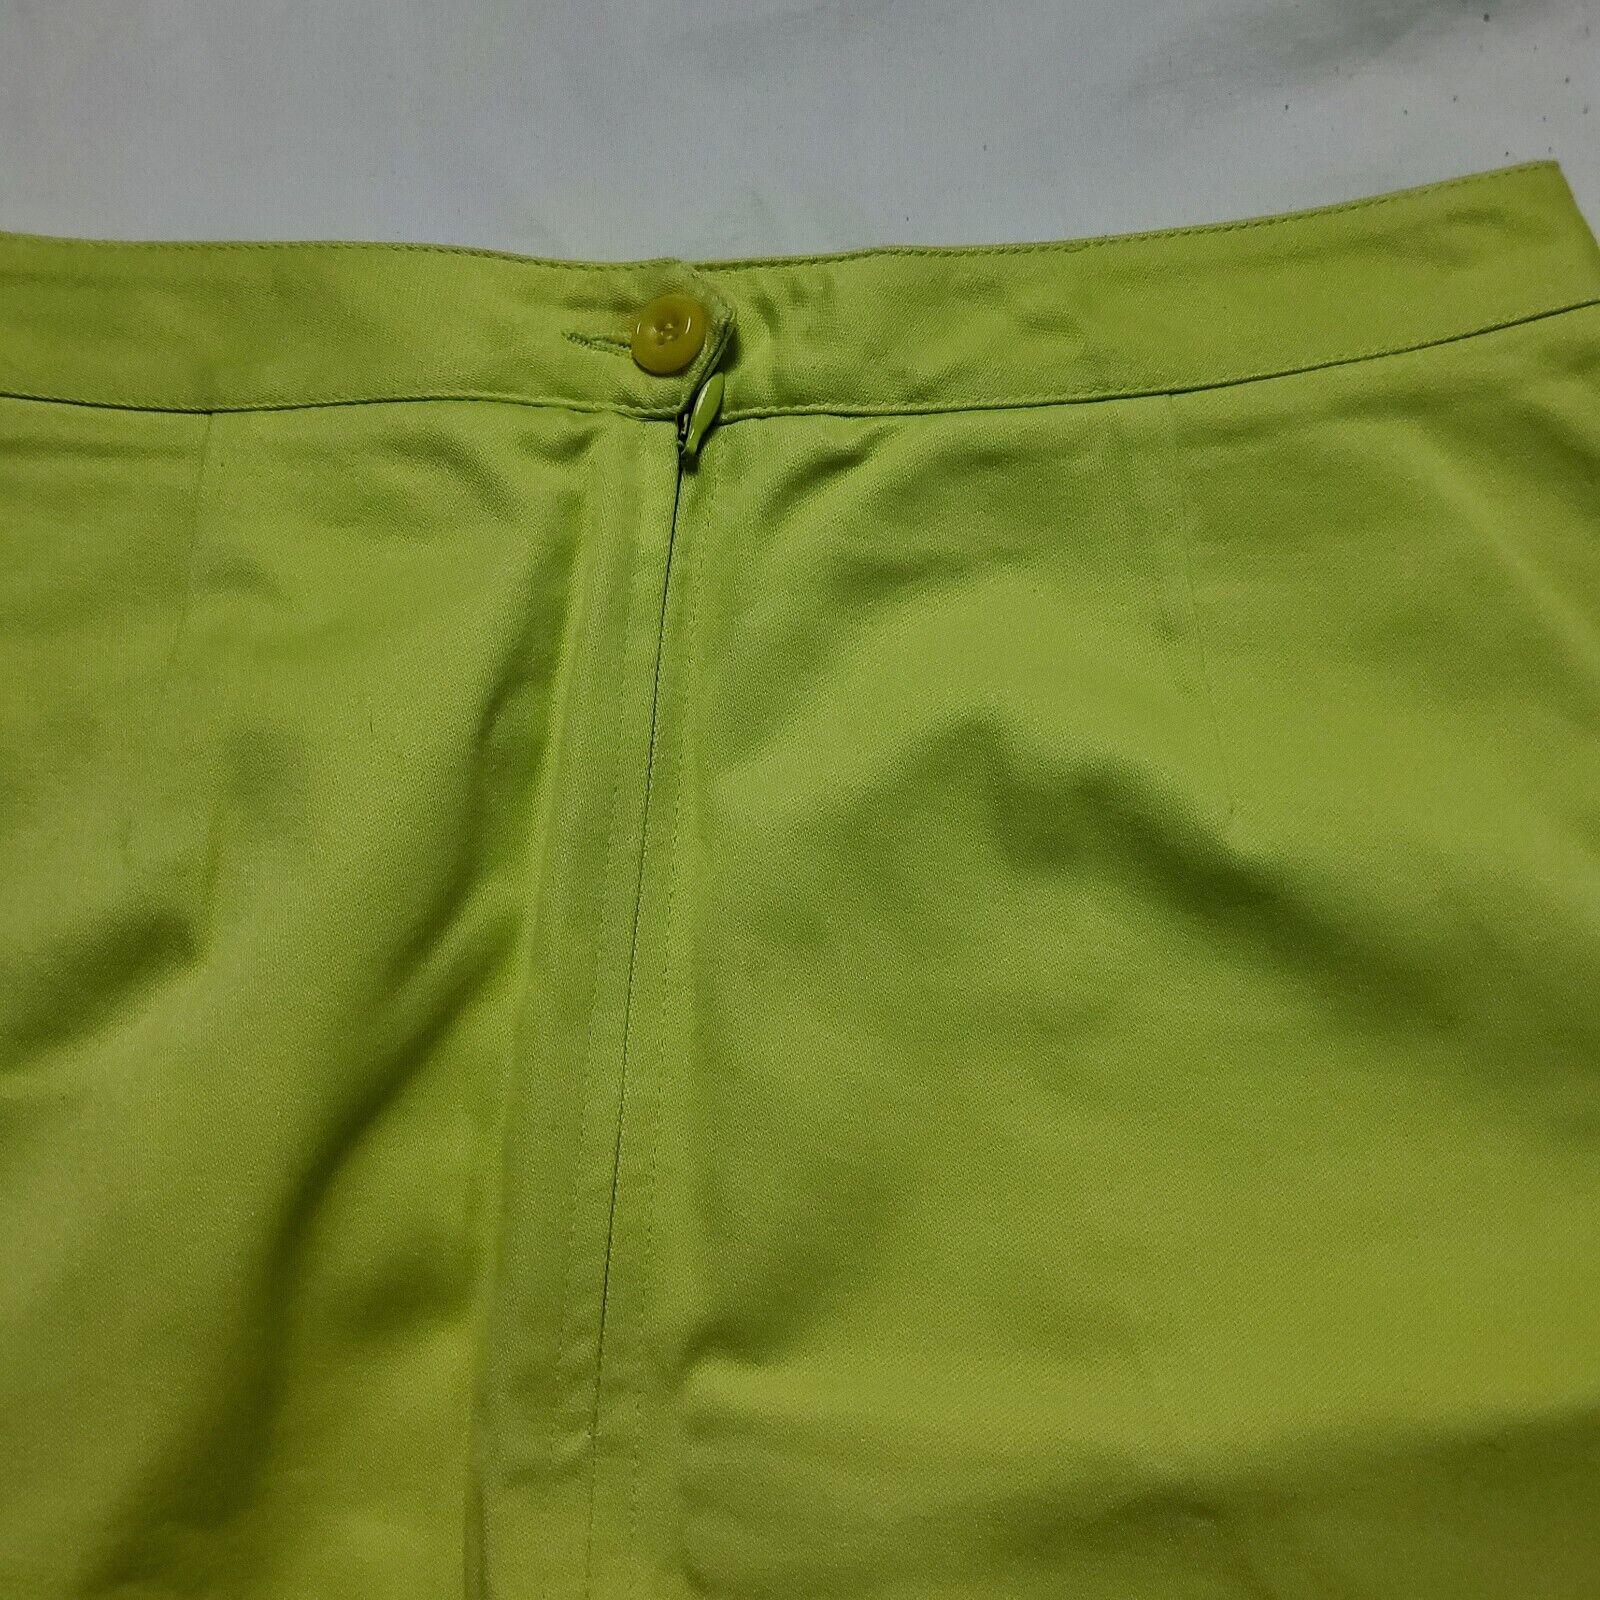 Esprit Neon Green Skirt - image 7